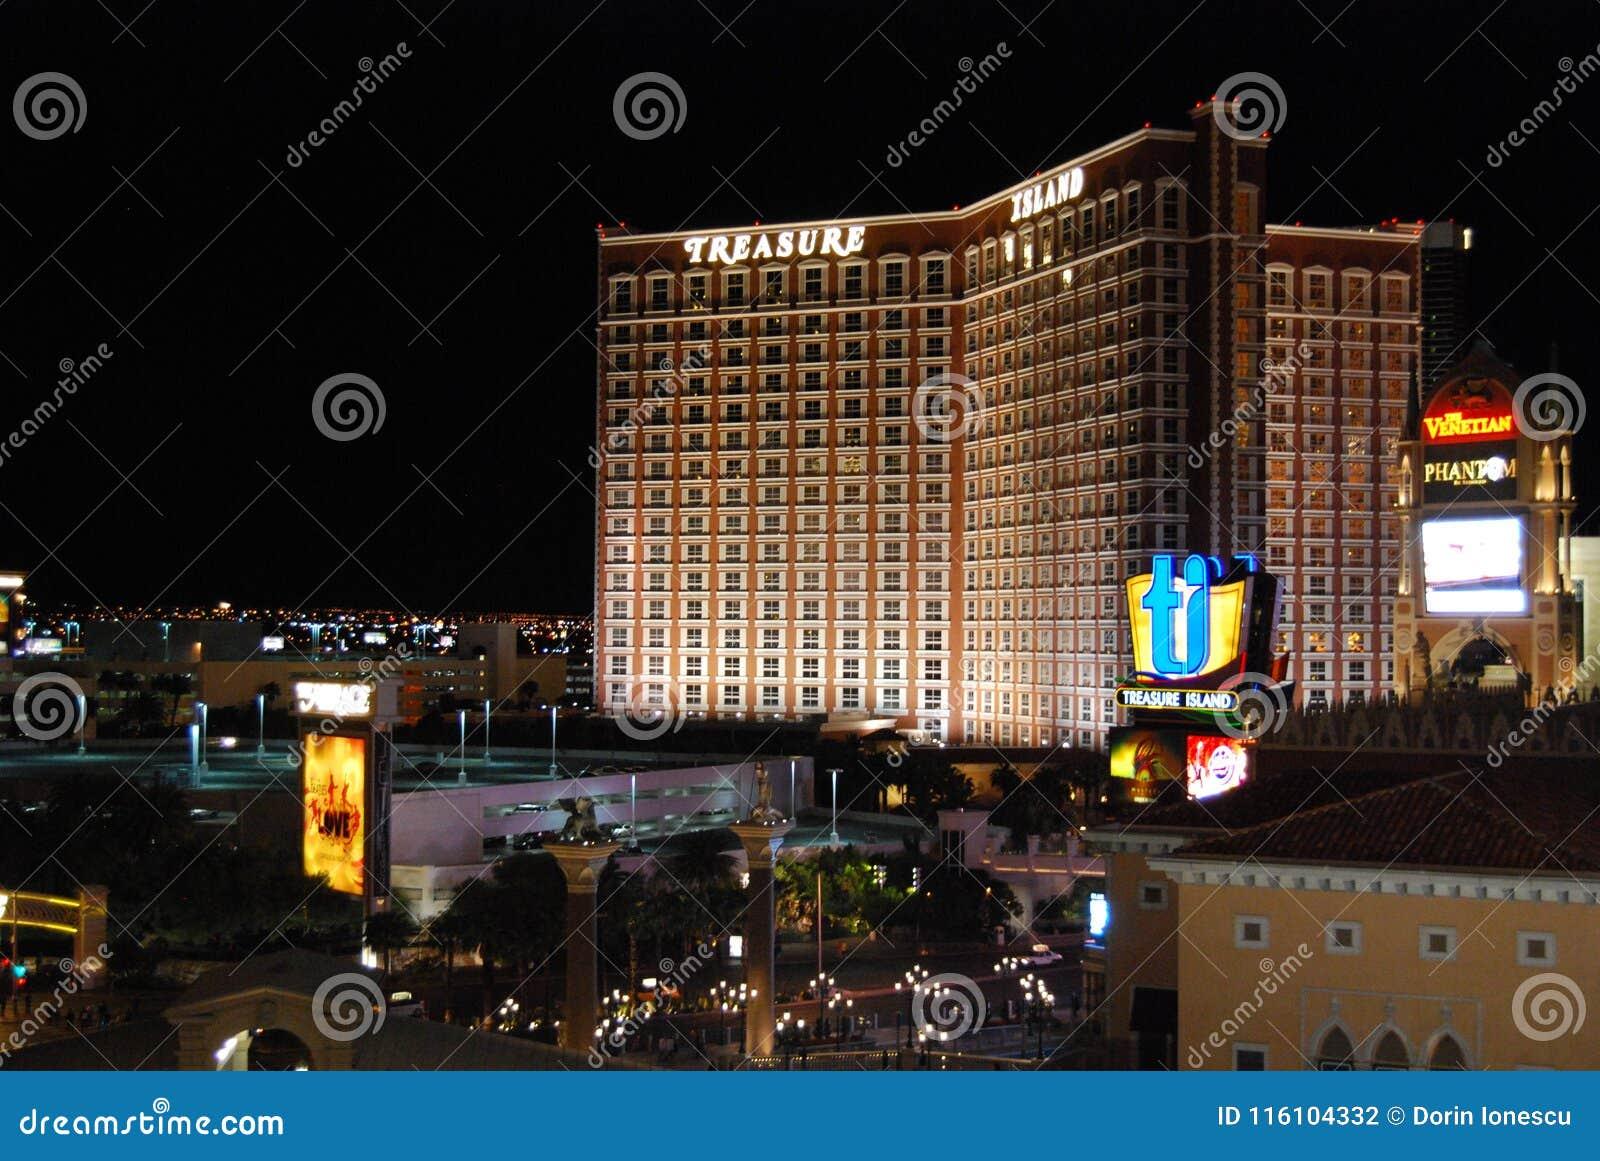 McCarran lotnisko międzynarodowe, Las Vegas, Las Vegas pasek Palazzo, obszar wielkomiejski, noc, miasto, metropolia